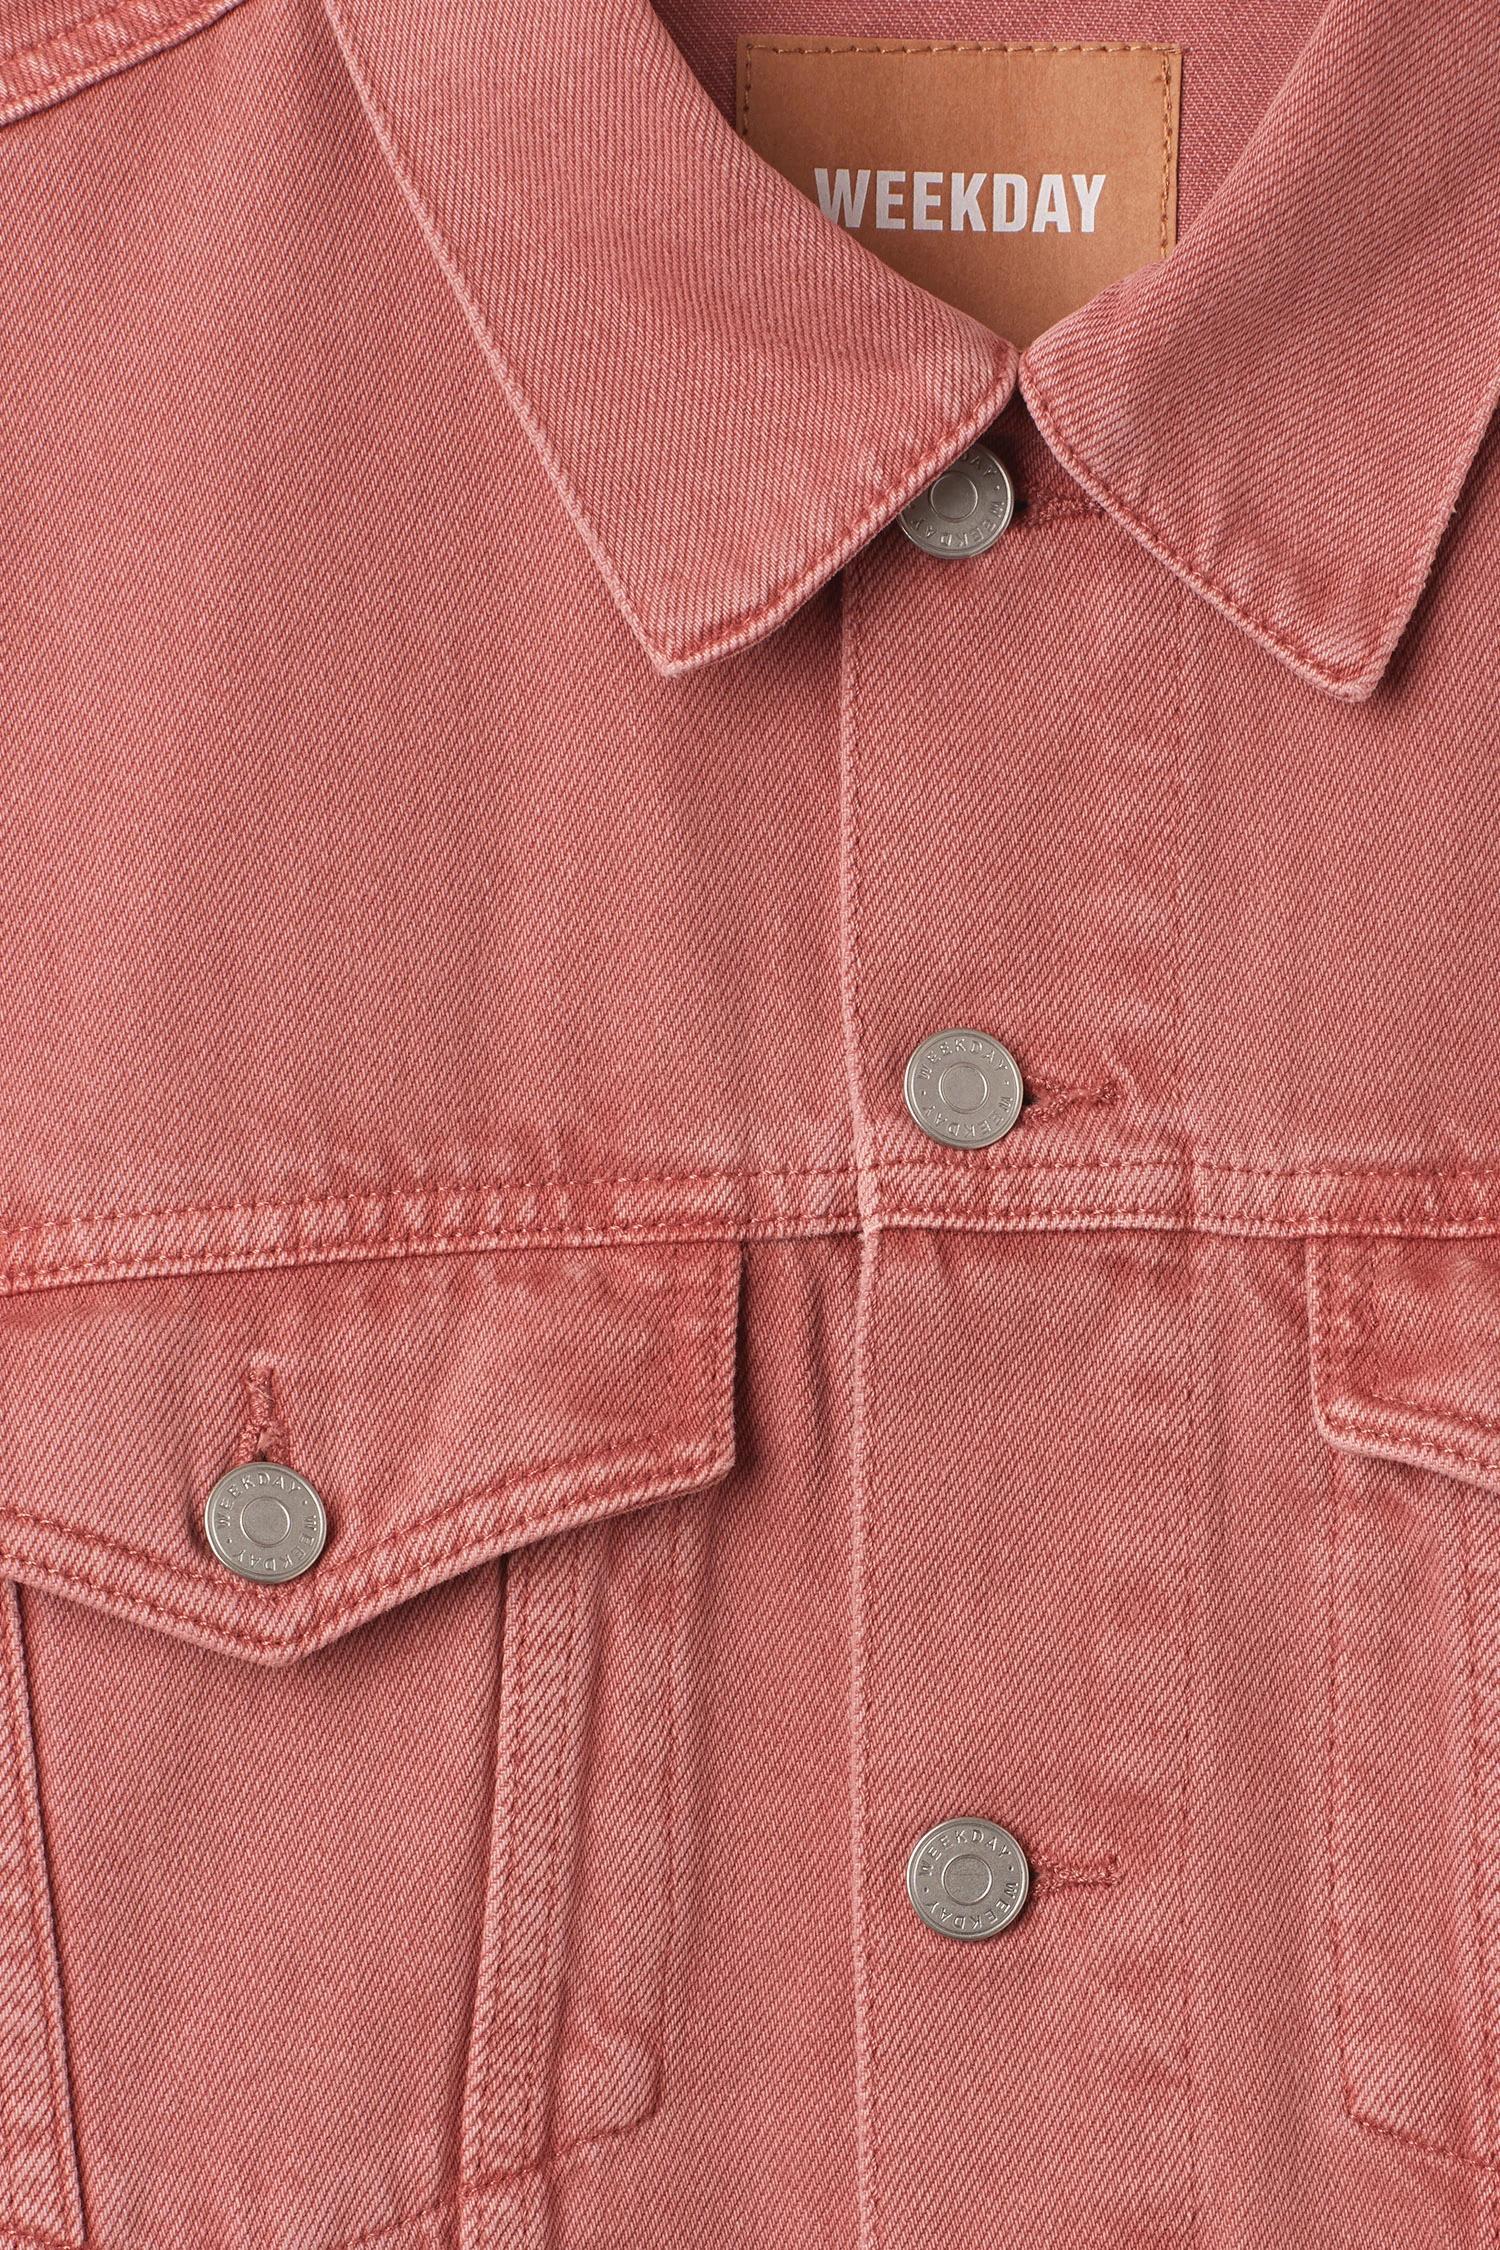 Weekday Denim Single Jacket Rose in Coral (Pink) for Men